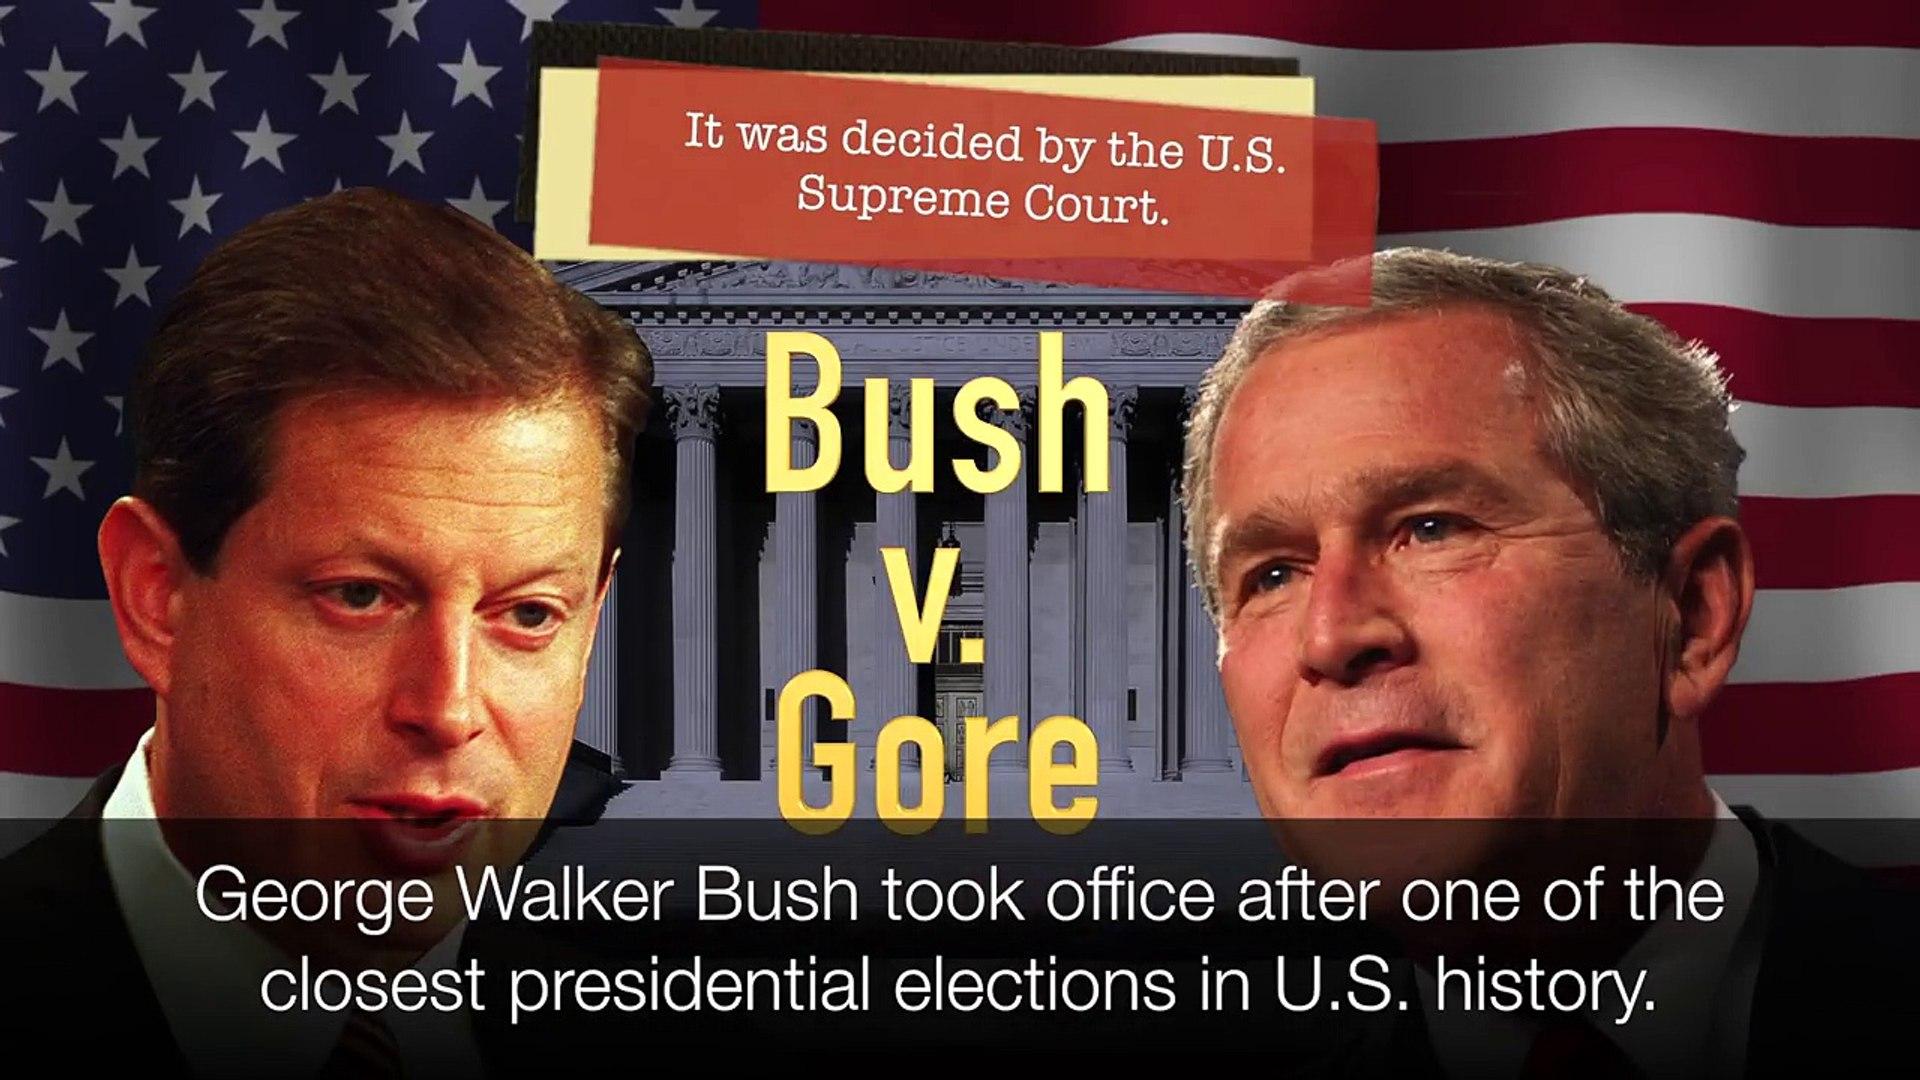 America's Presidents - George W. Bush